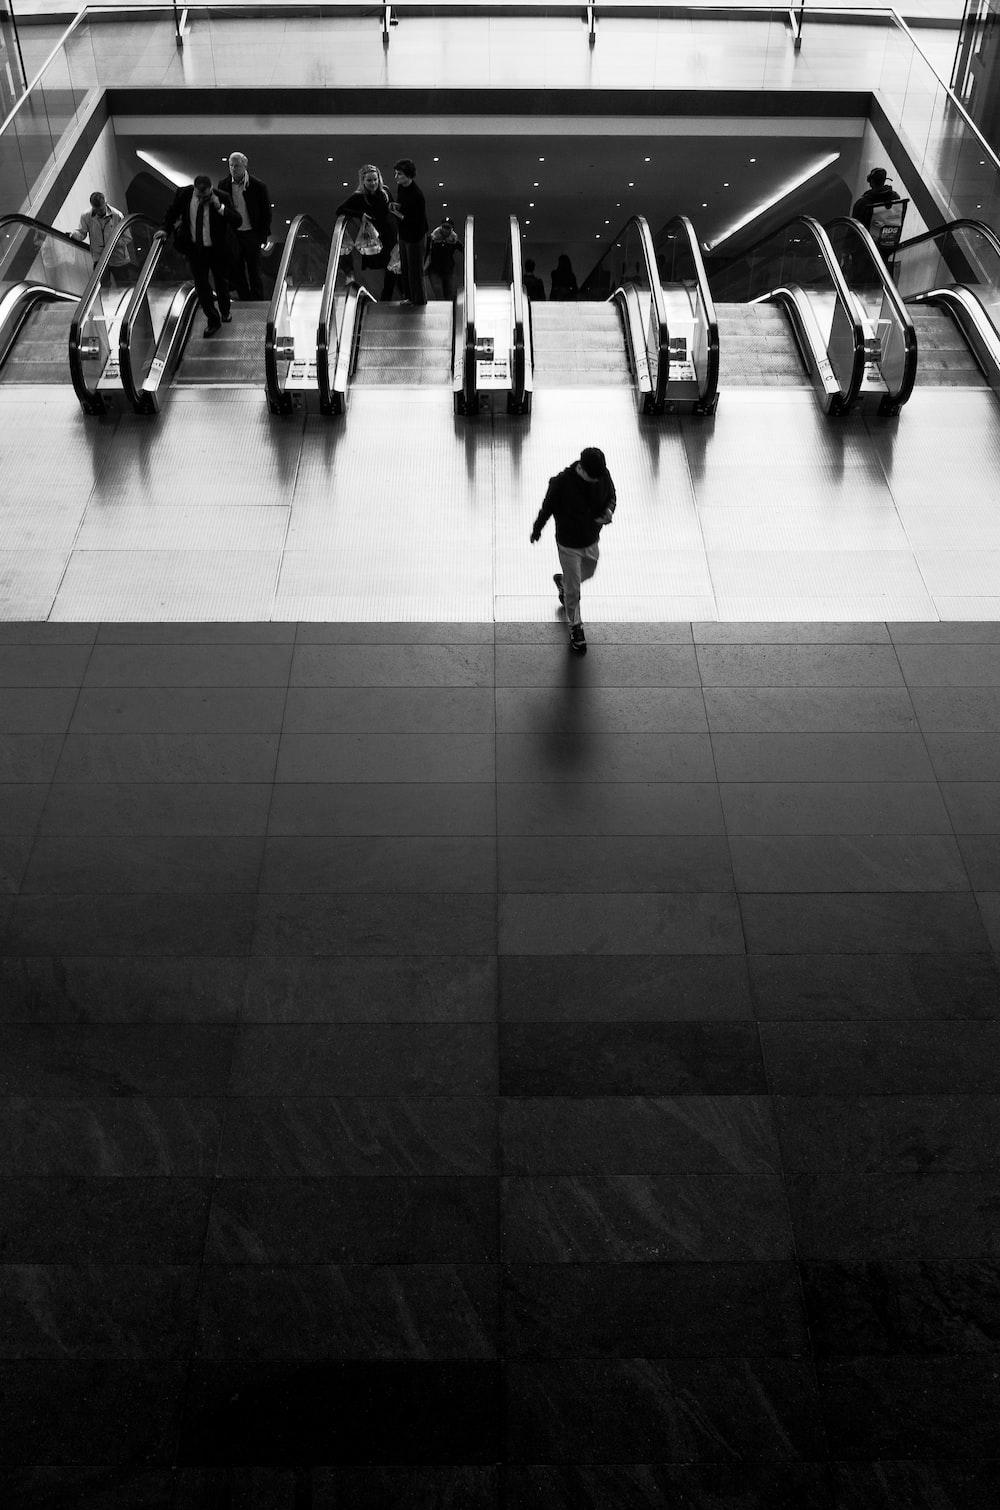 grayscale photography of man walking near escalator